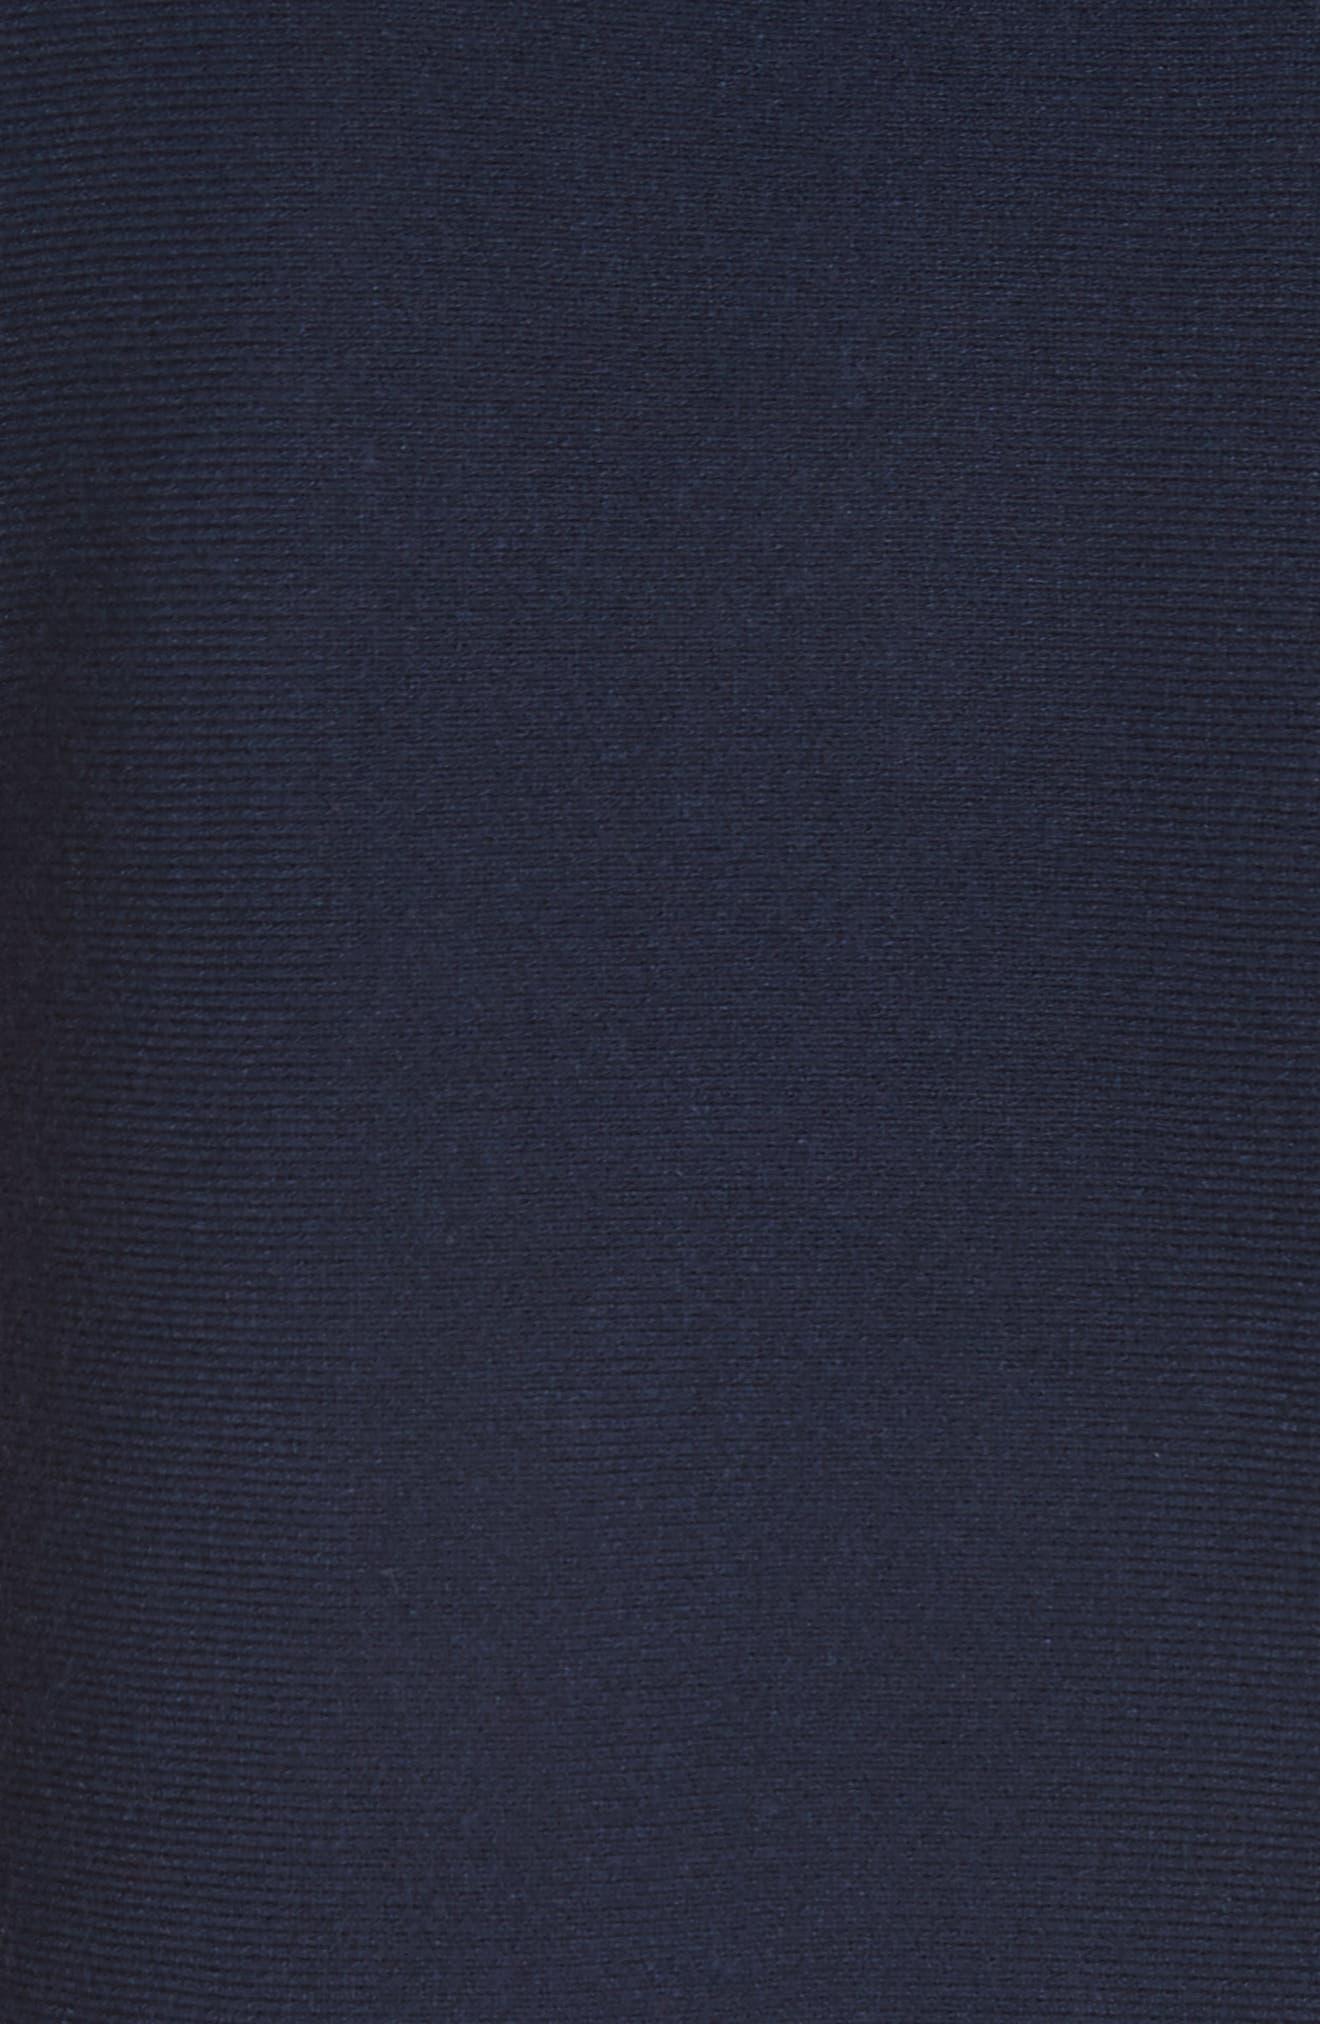 Scallop Hem Shift Dress,                             Alternate thumbnail 5, color,                             Navy